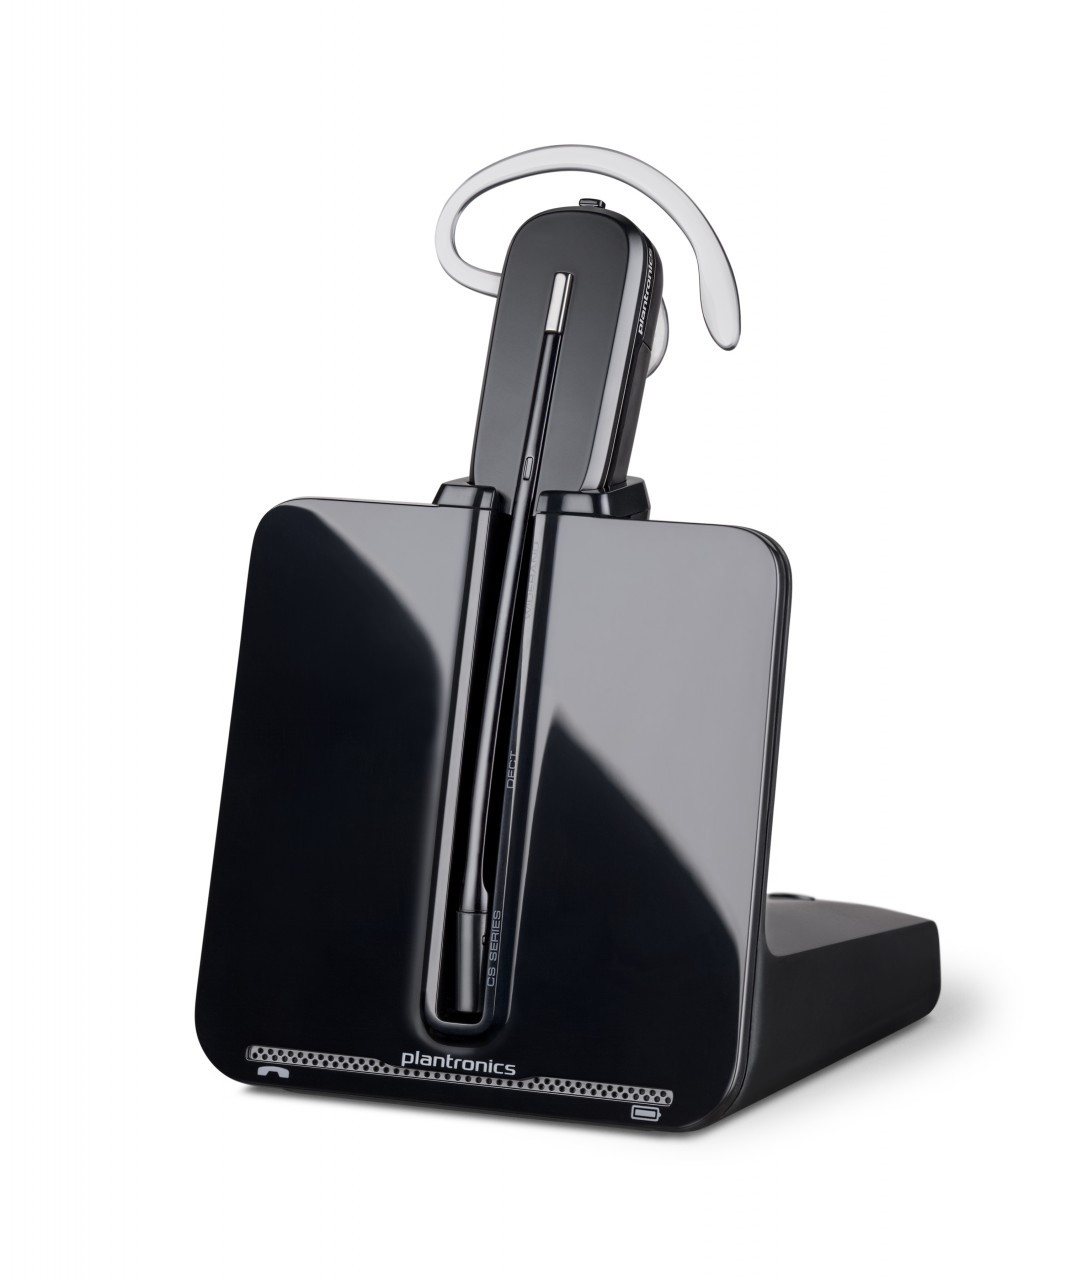 Cisco Compatible Plantronics Cs 540 Wireless Headset Convertible 84693 01 Cs540 Wireless 520 Dect Plantronics Wireless Cs540 Headset Use With Cisco 7900 Series